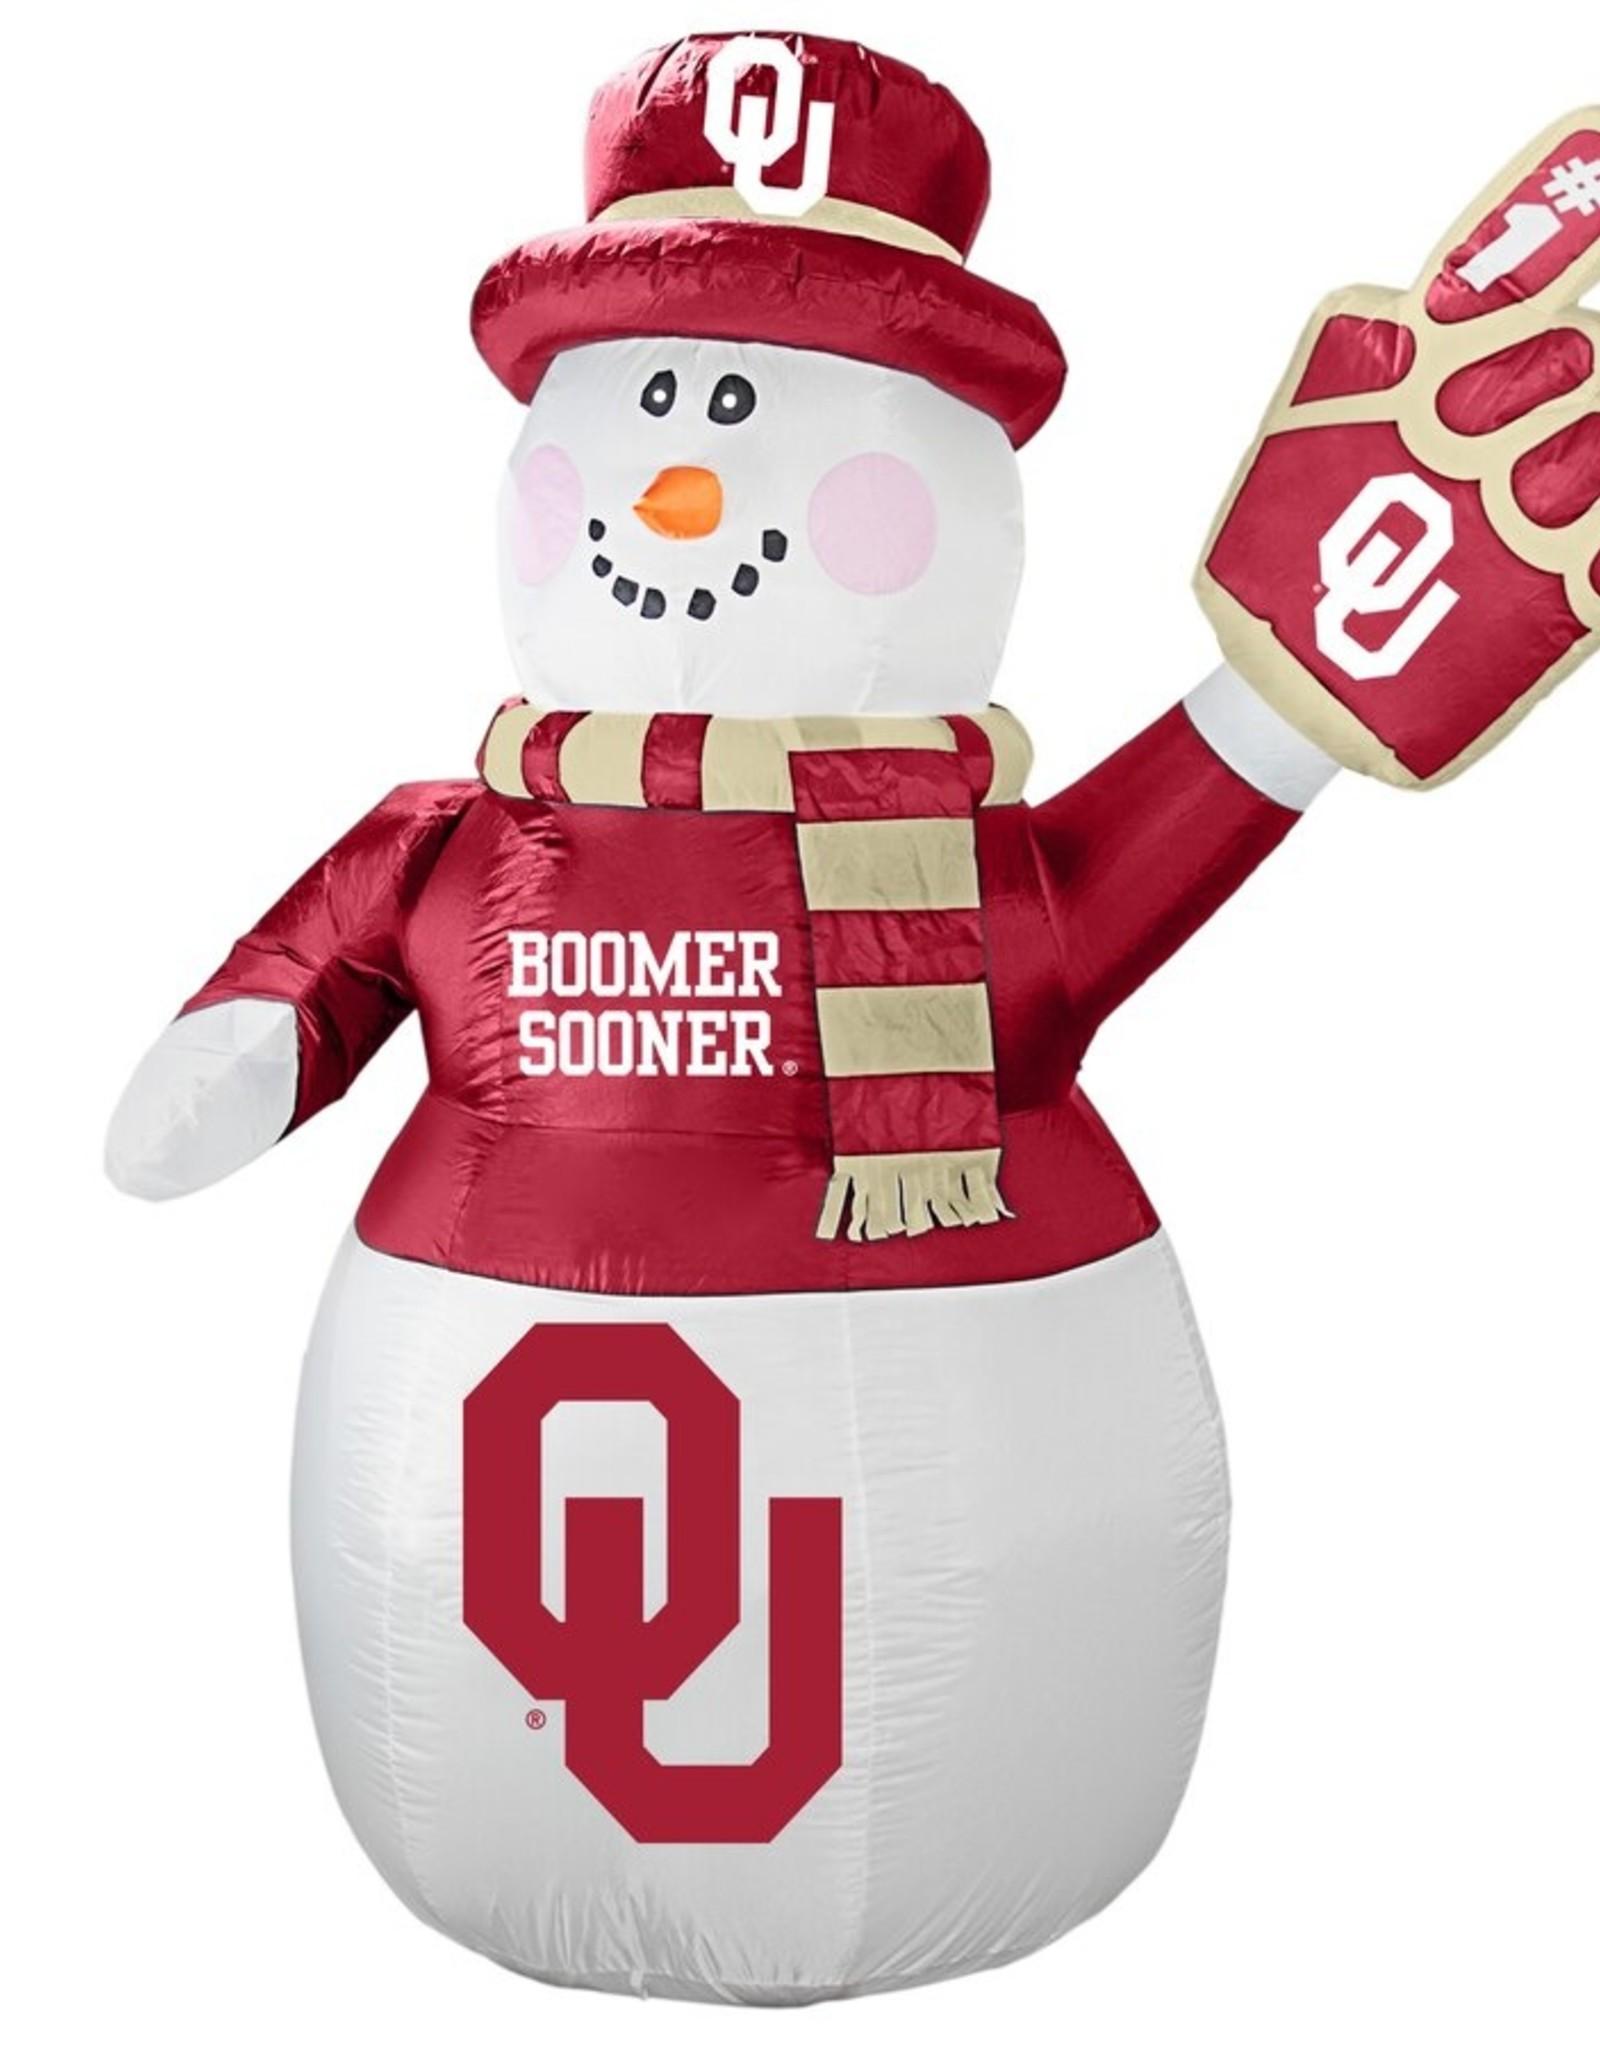 Topperscott OU 7 Ft. Tall Inflatable Snowman